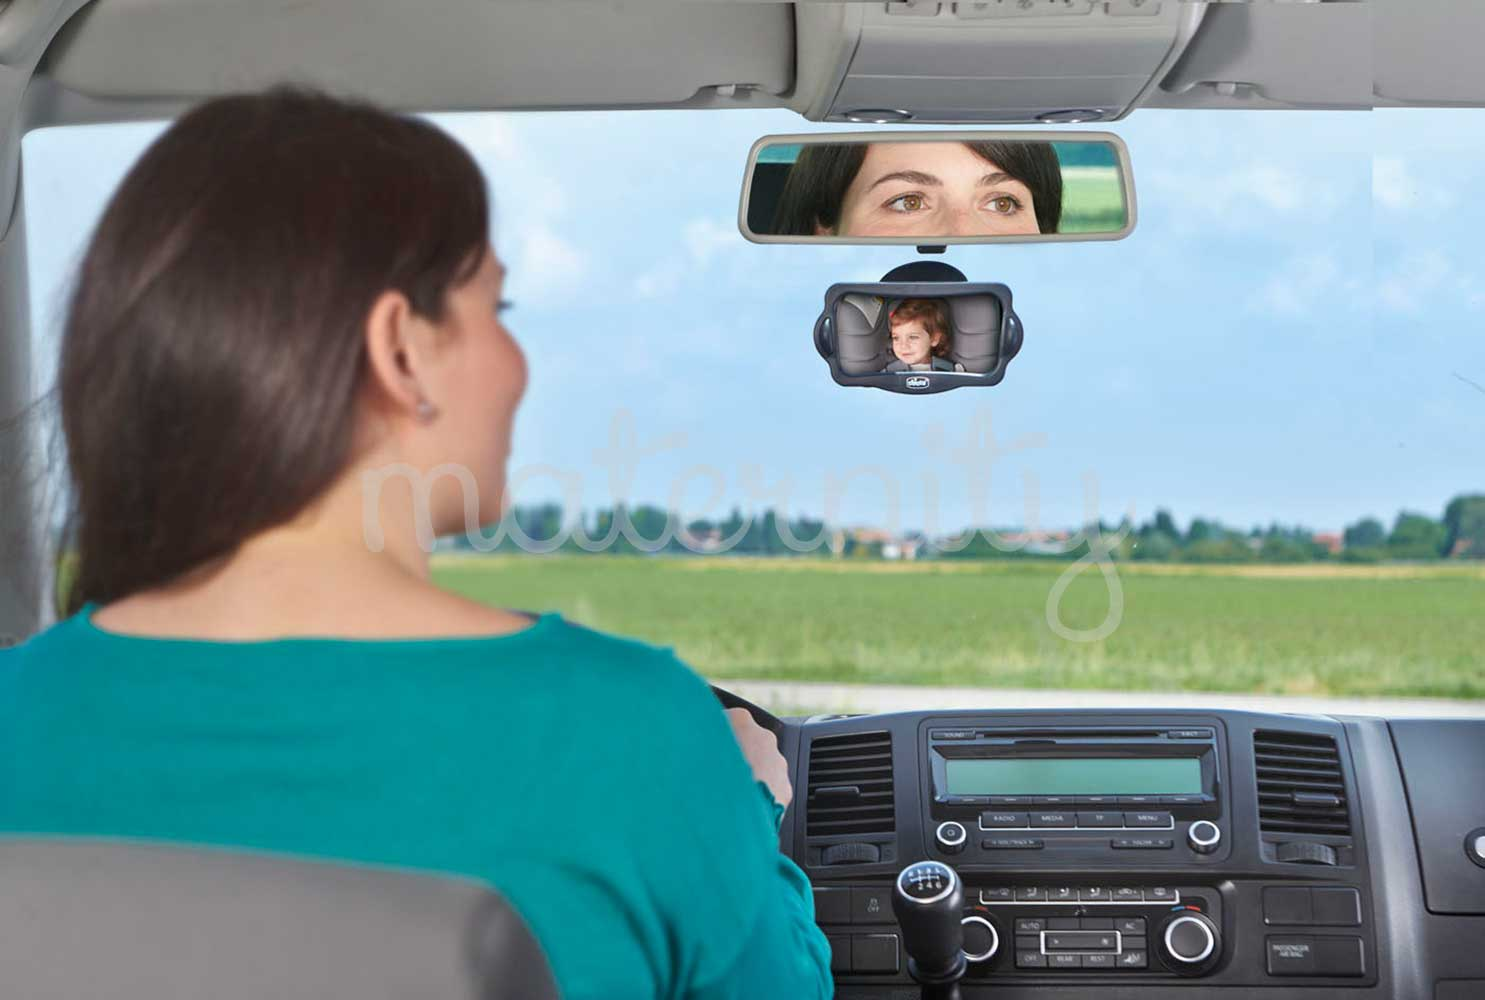 Chicco Καθρεφτης αυτοκινήτου για Παρμπριζ